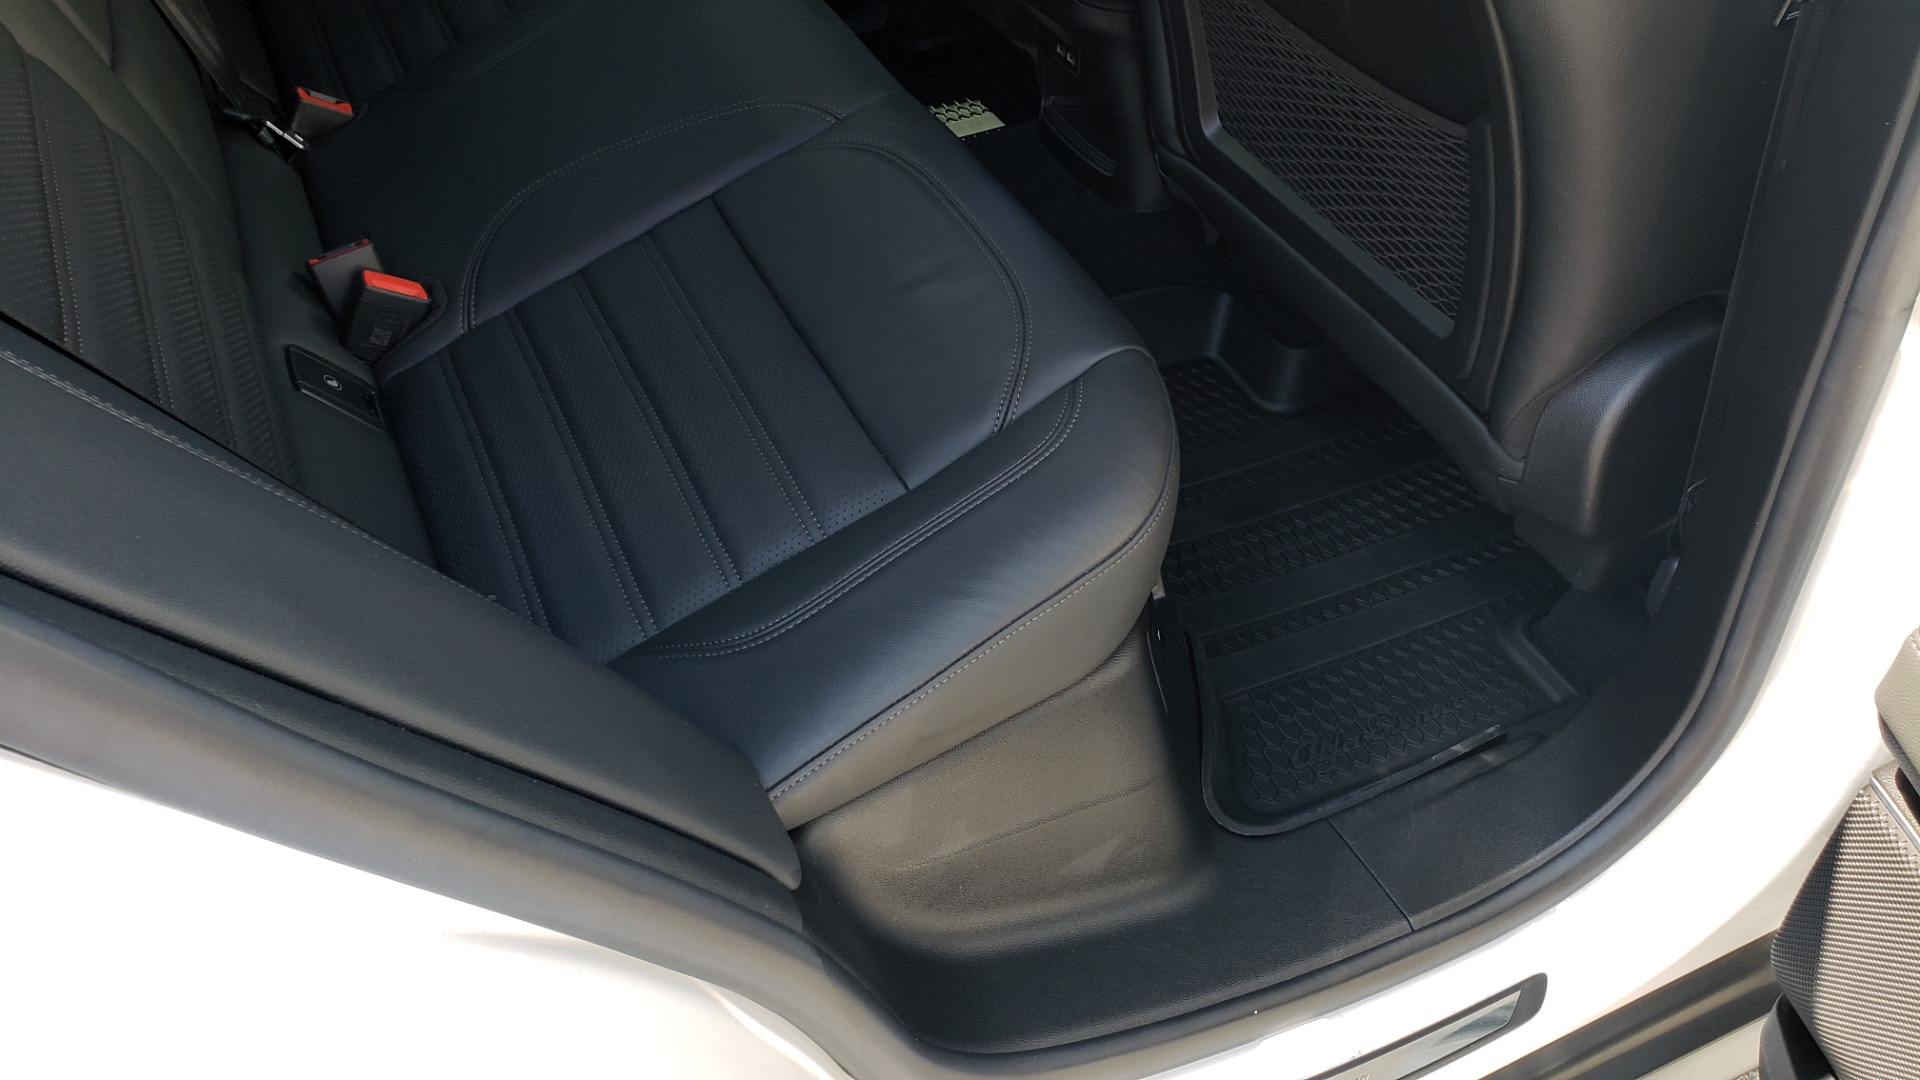 Used 2019 Alfa Romeo STELVIO TI SPORT AWD / 2.0L TURBO / 8-SPD AUTO / DRVR ASST / REARVIEW for sale $37,495 at Formula Imports in Charlotte NC 28227 75